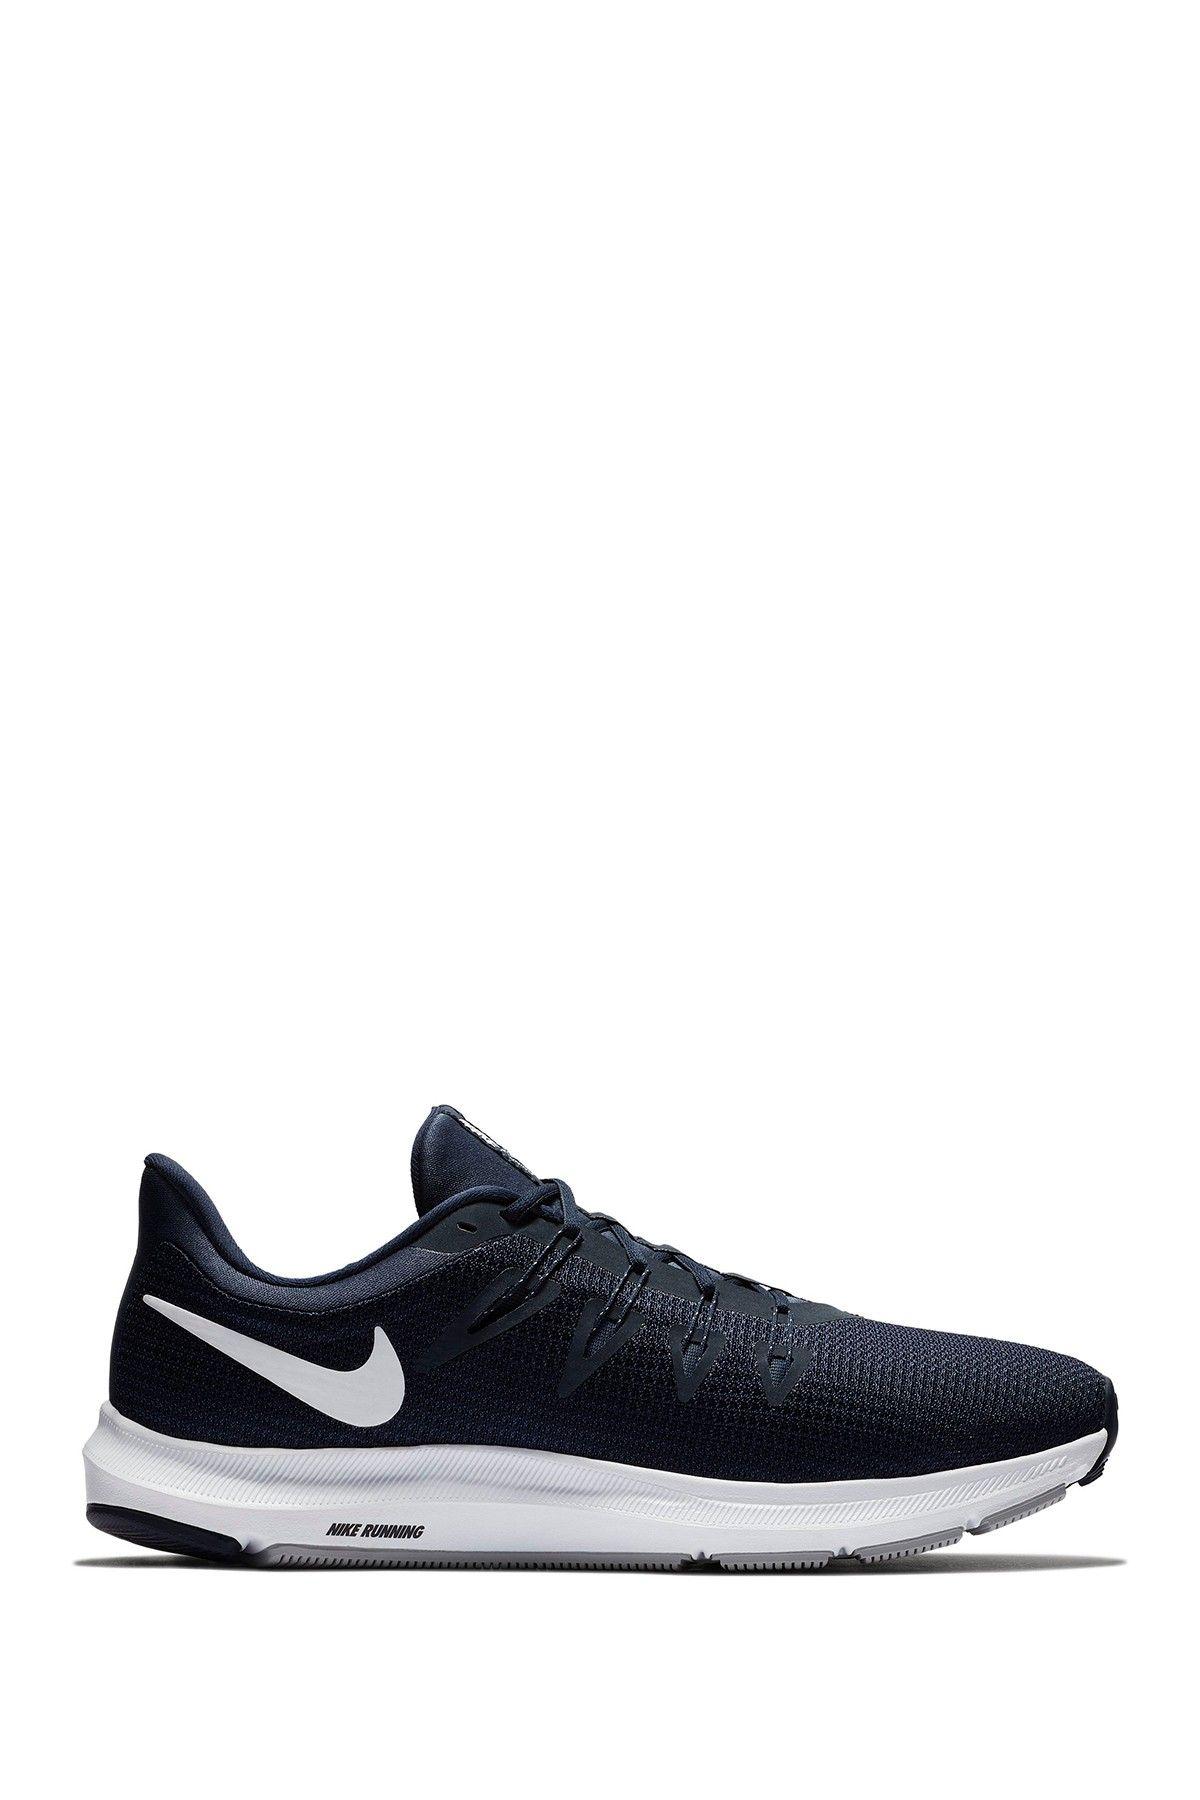 0140881bdad Image of Nike Swift Turbo Running Shoe Swift